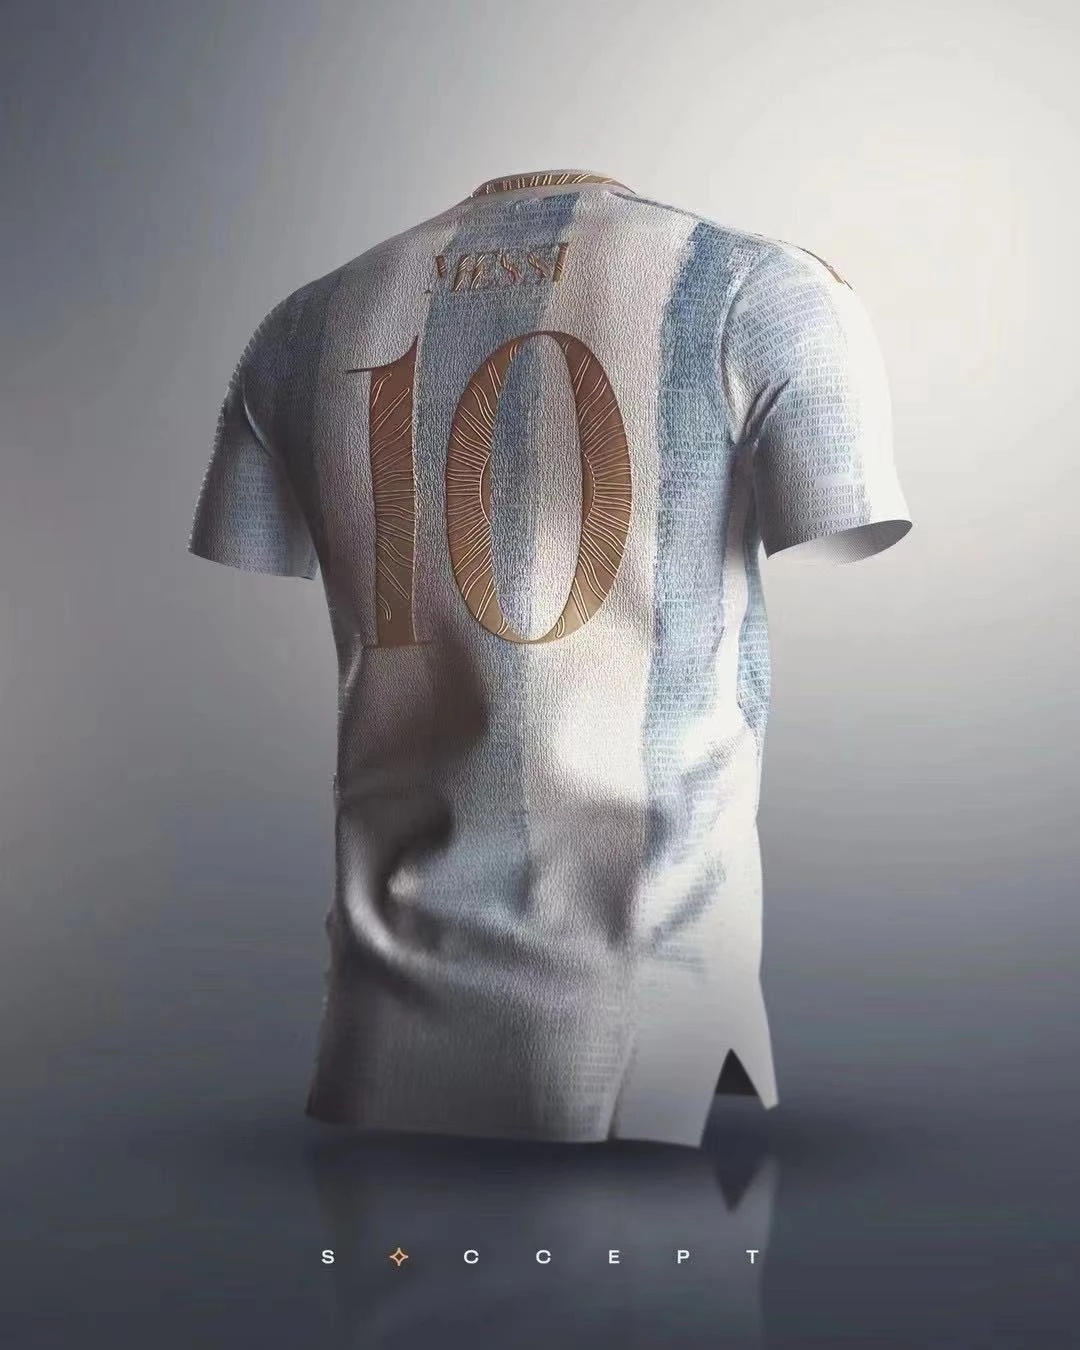 2021 Аргентинская футбольная майка, футболка с Месси на заказ, Кун, агуреро, Марадона, Дыбала, Ди, Мария, окампос